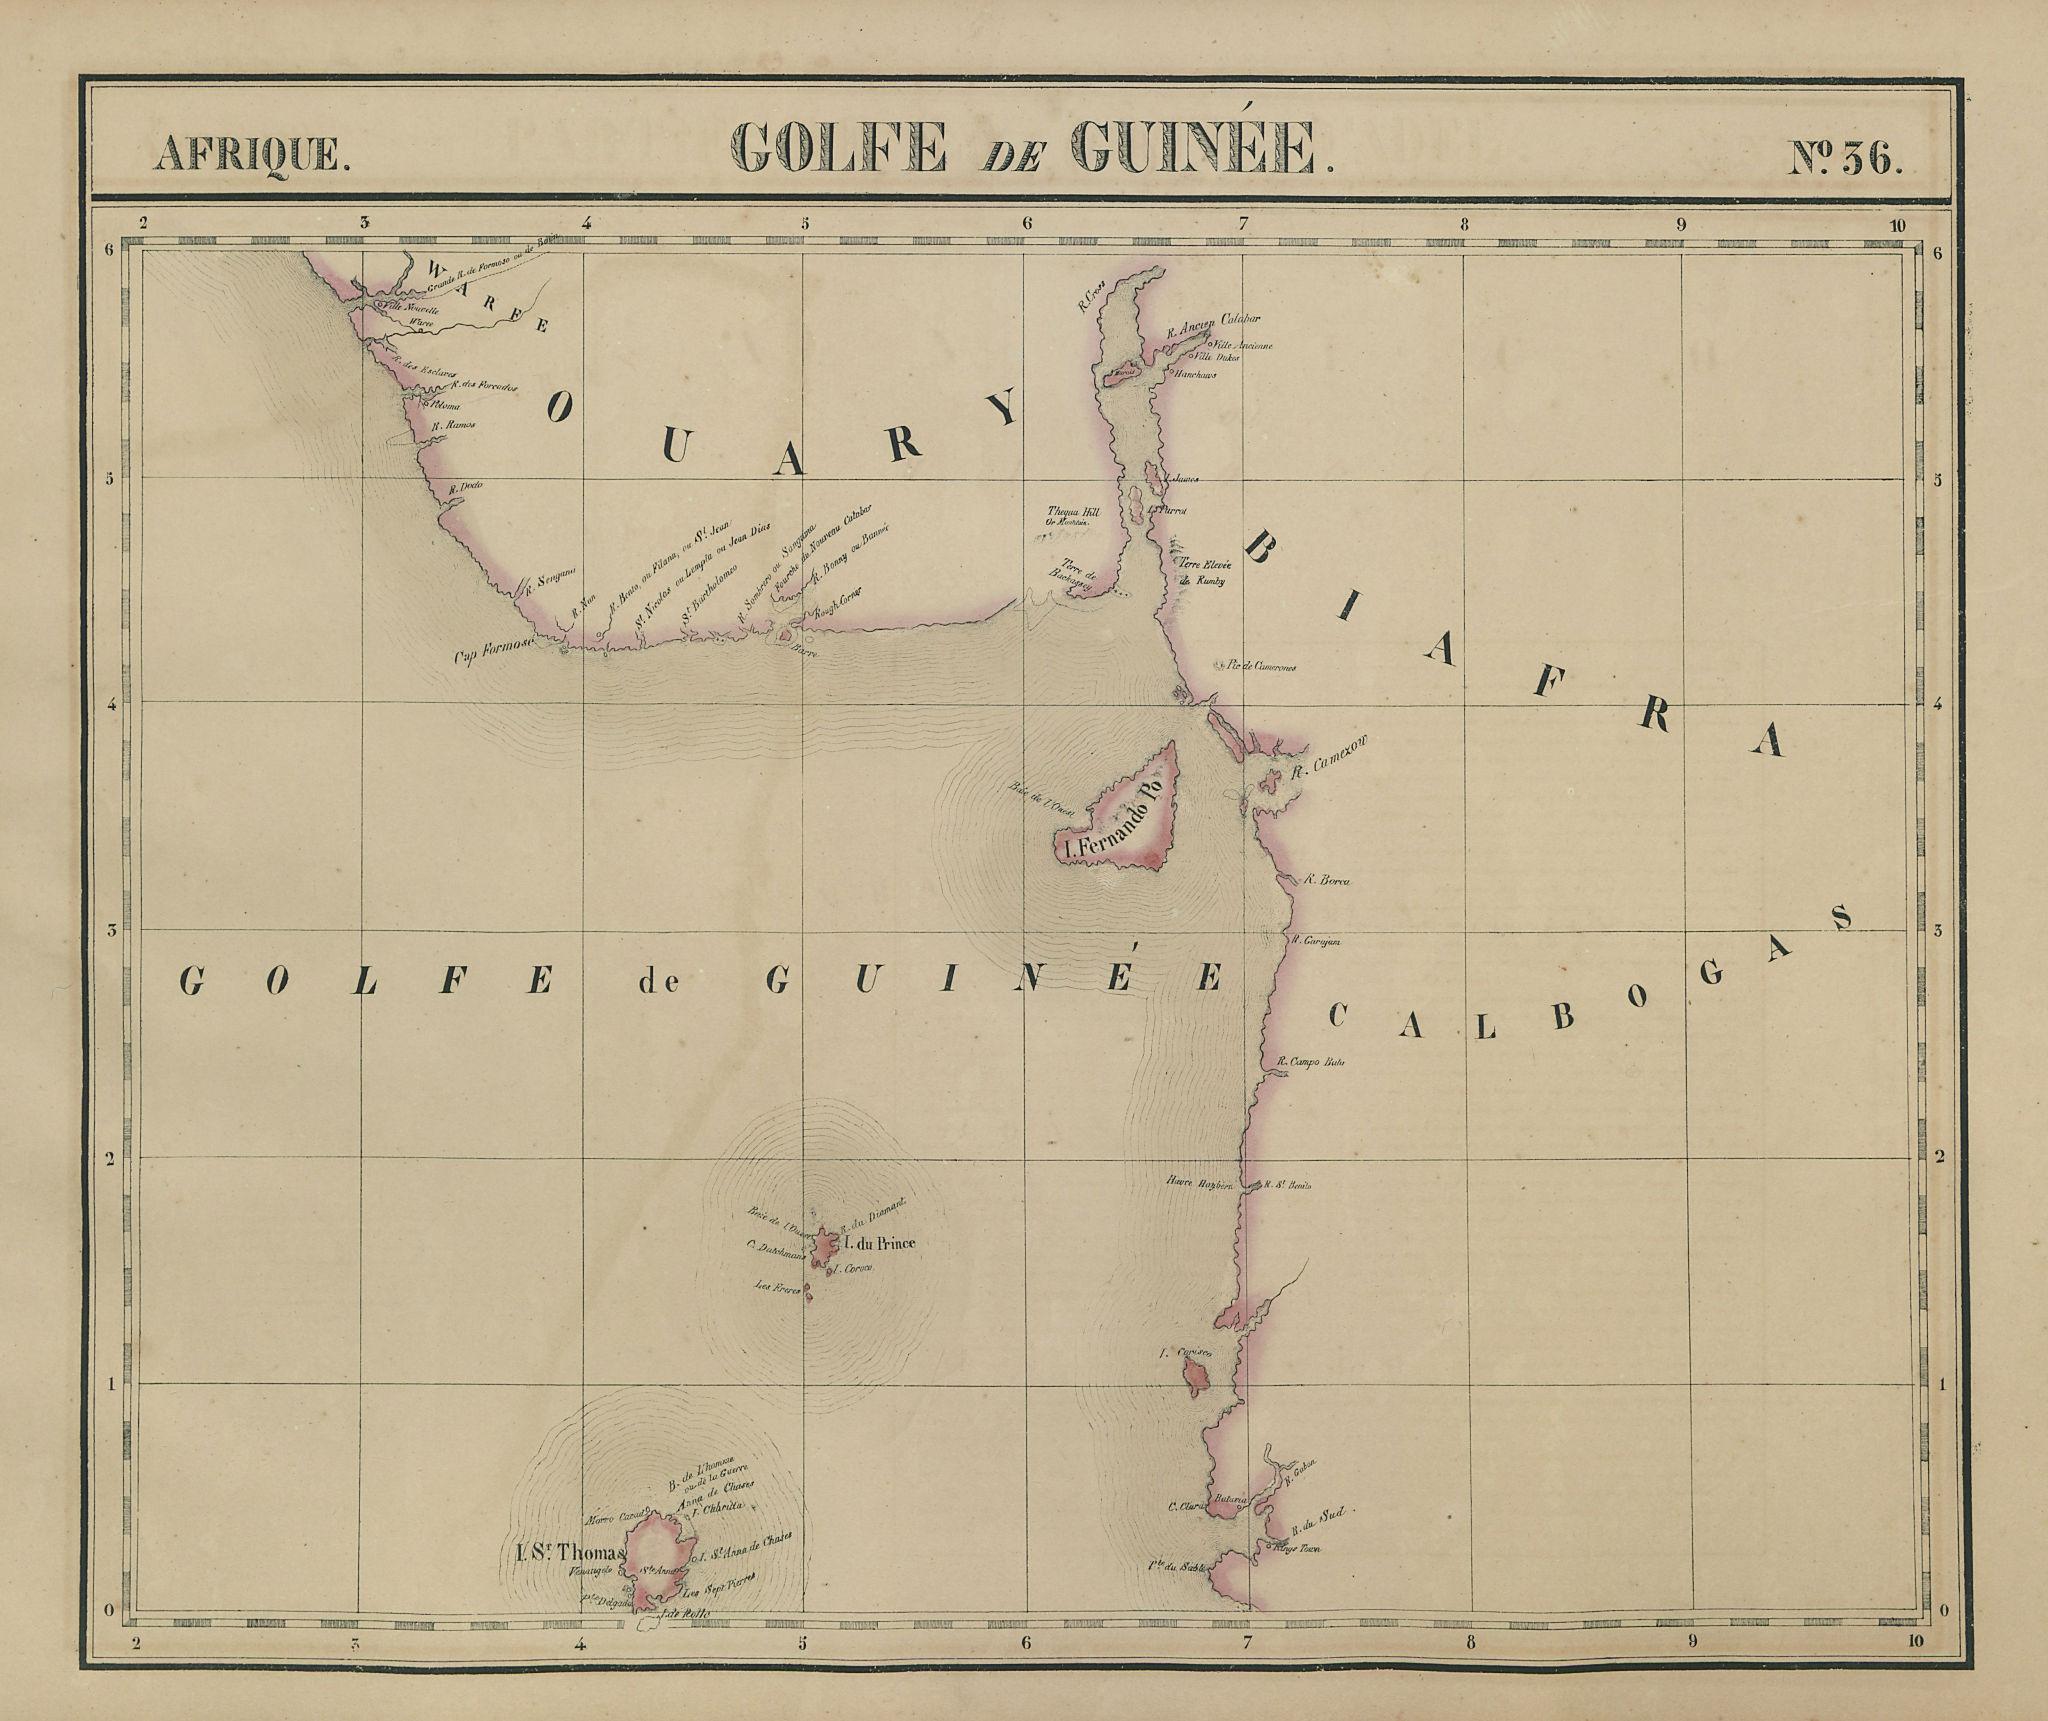 Afrique. Golfe du Guinée #36. Nigeria Cameroon Gabon. VANDERMAELEN 1827 map